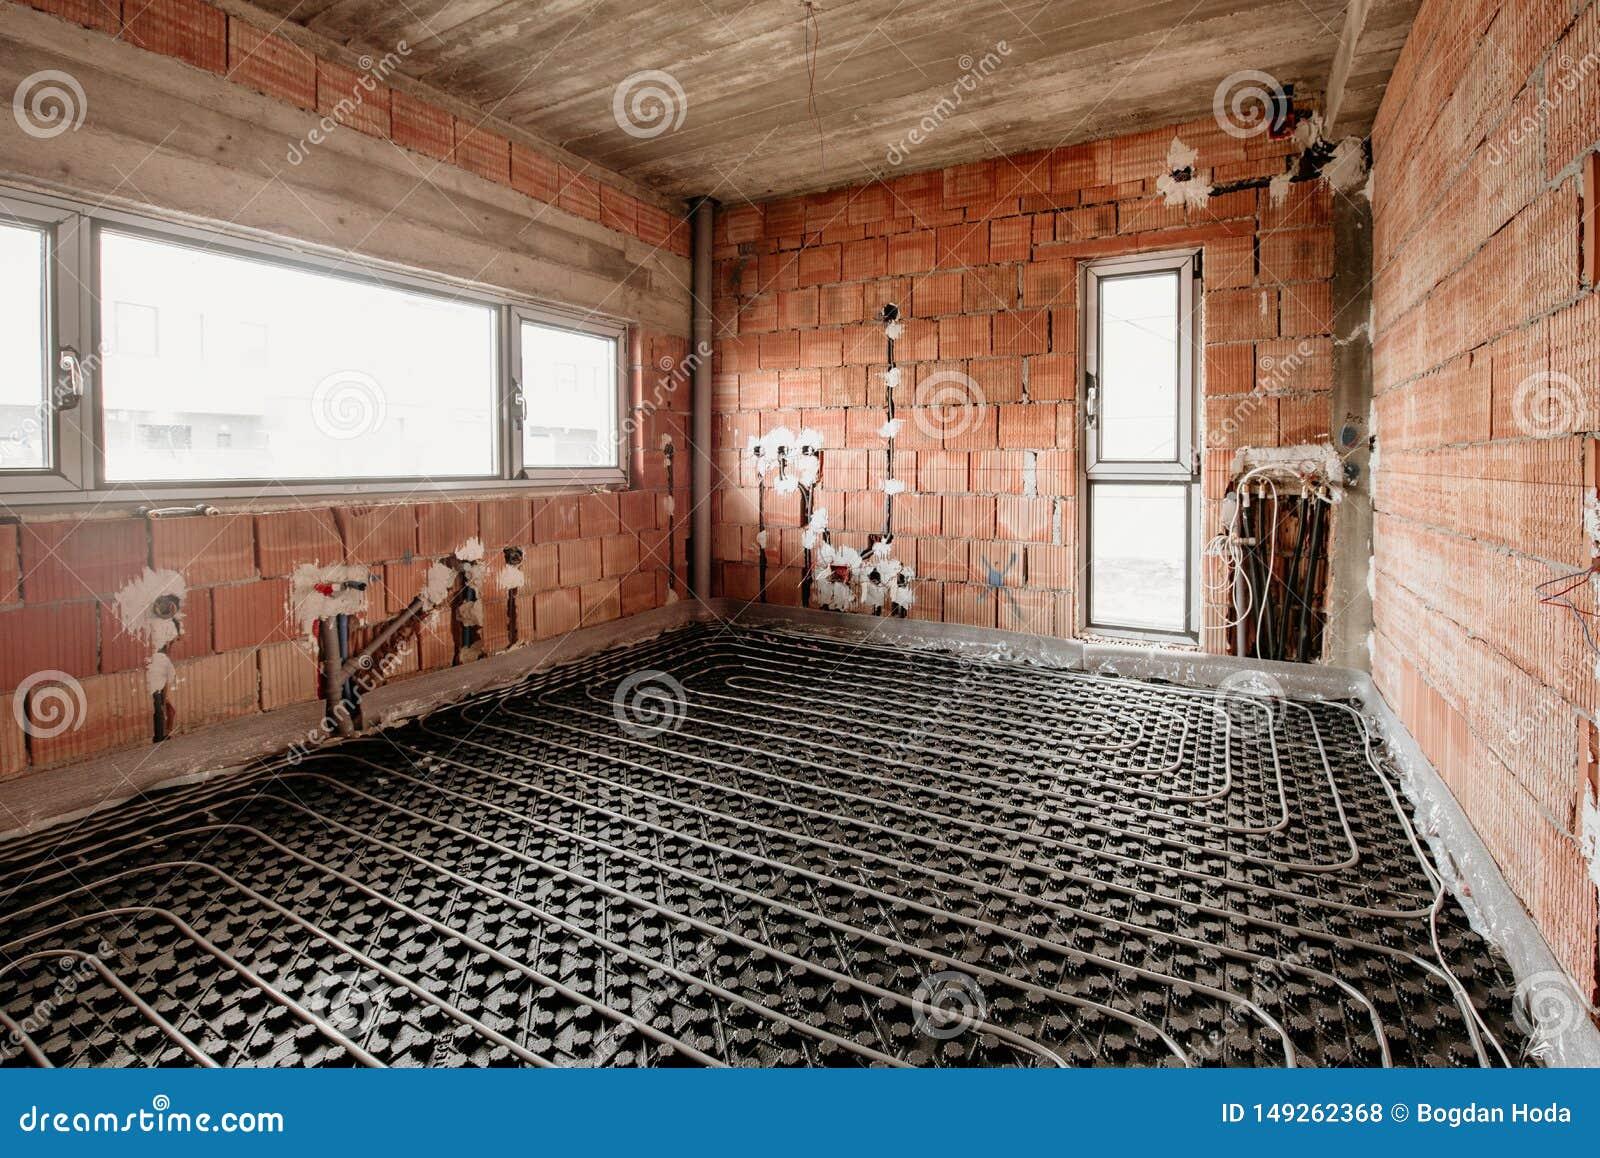 Radiant Underfloor Heating Installation With Flexible Tubing ... on basement heating, ceiling heating, boiler heating, wall heating, home heating, infloor heating, water heating, radiator heating, oil heating, gas heating,